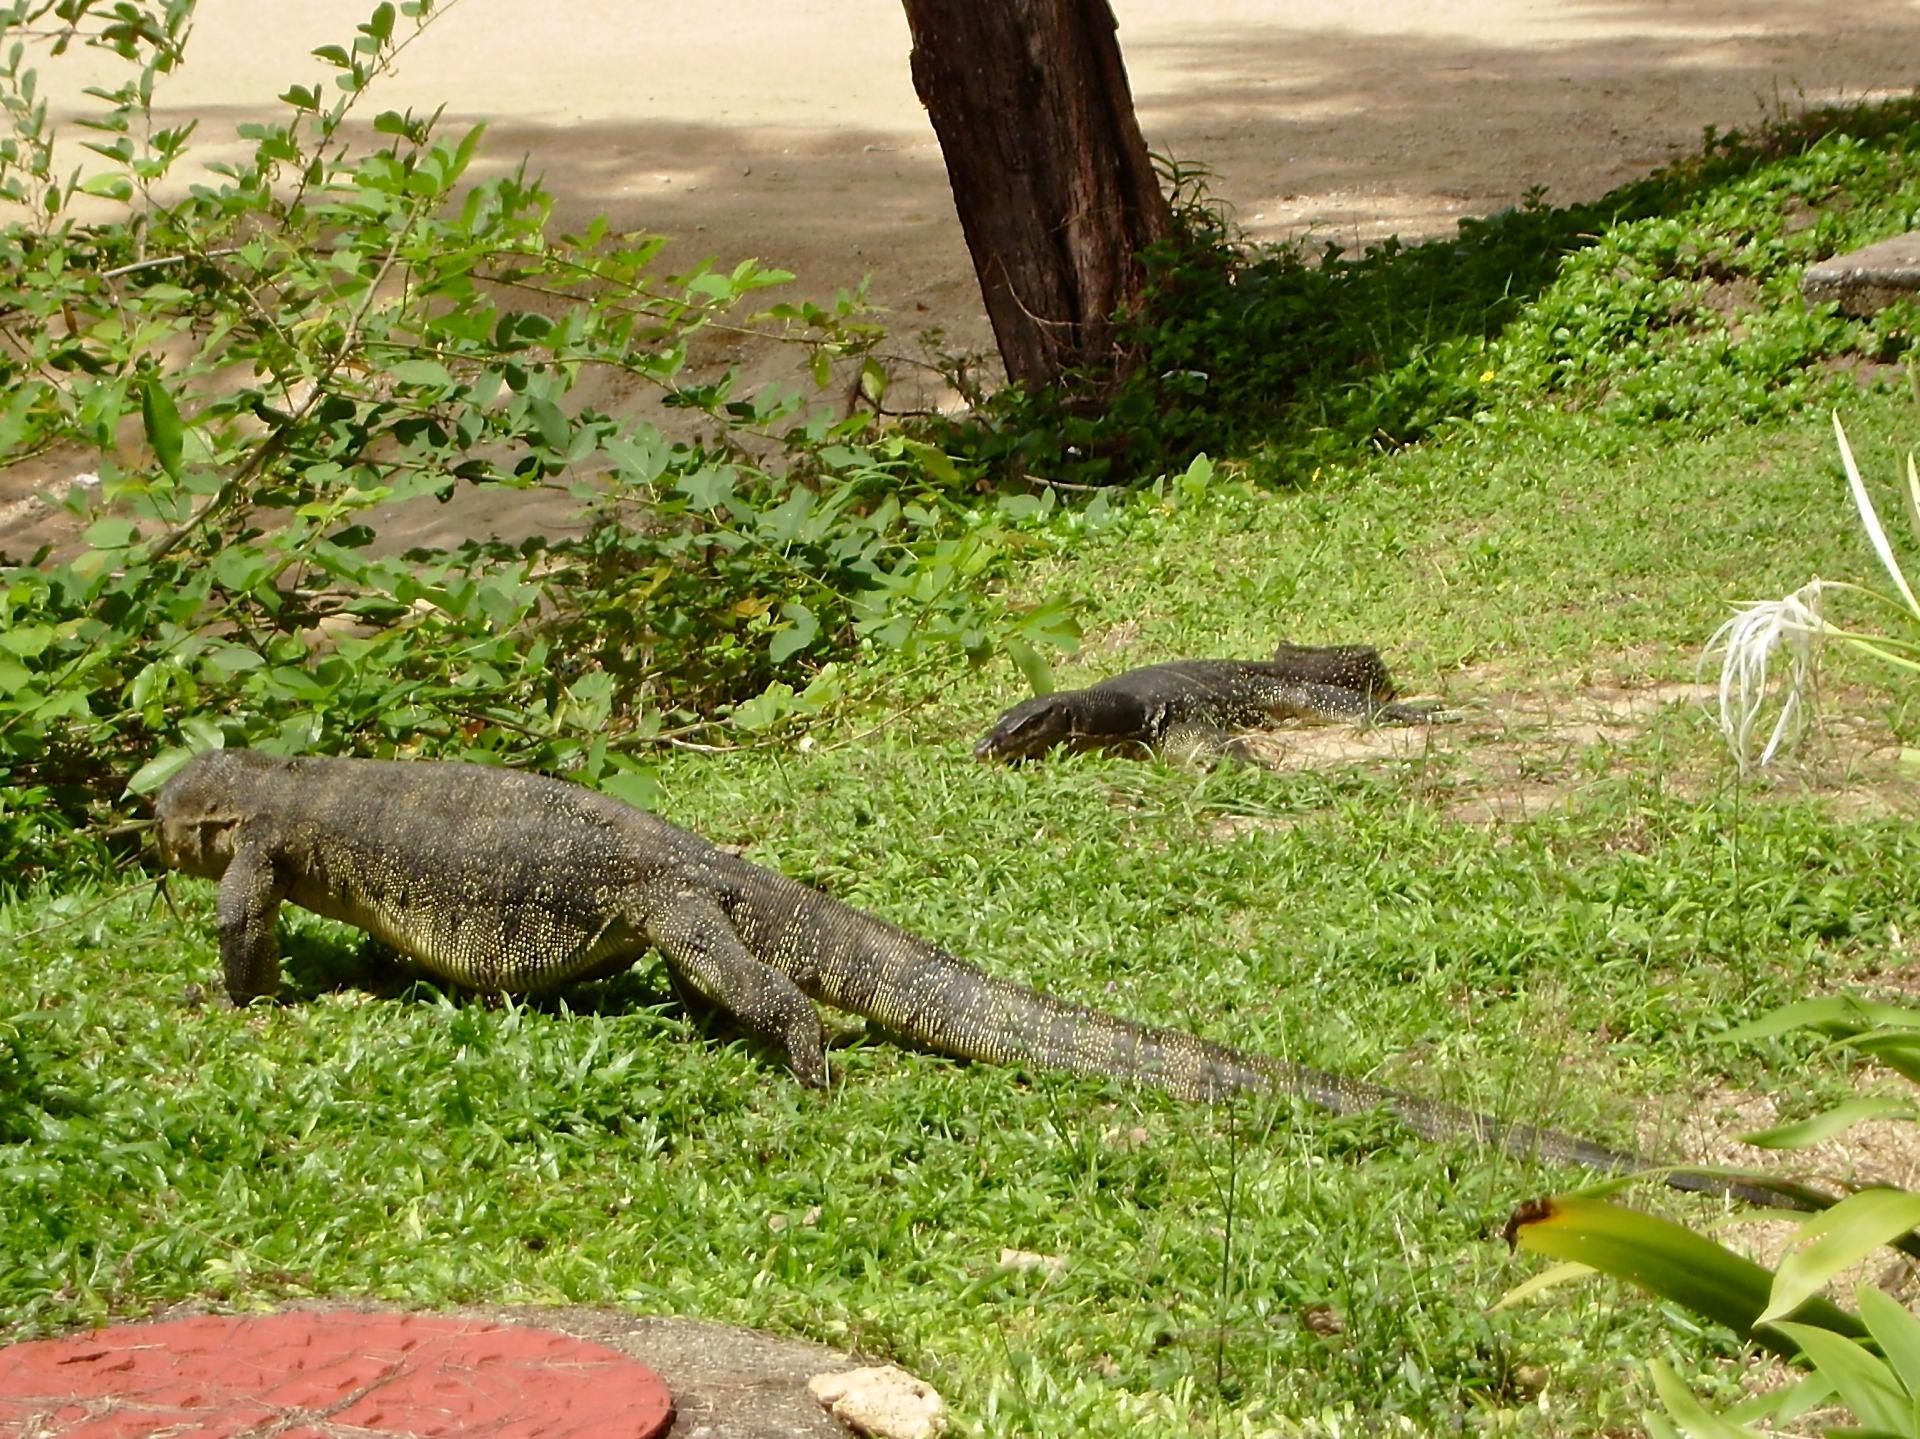 Tioman giant lizard